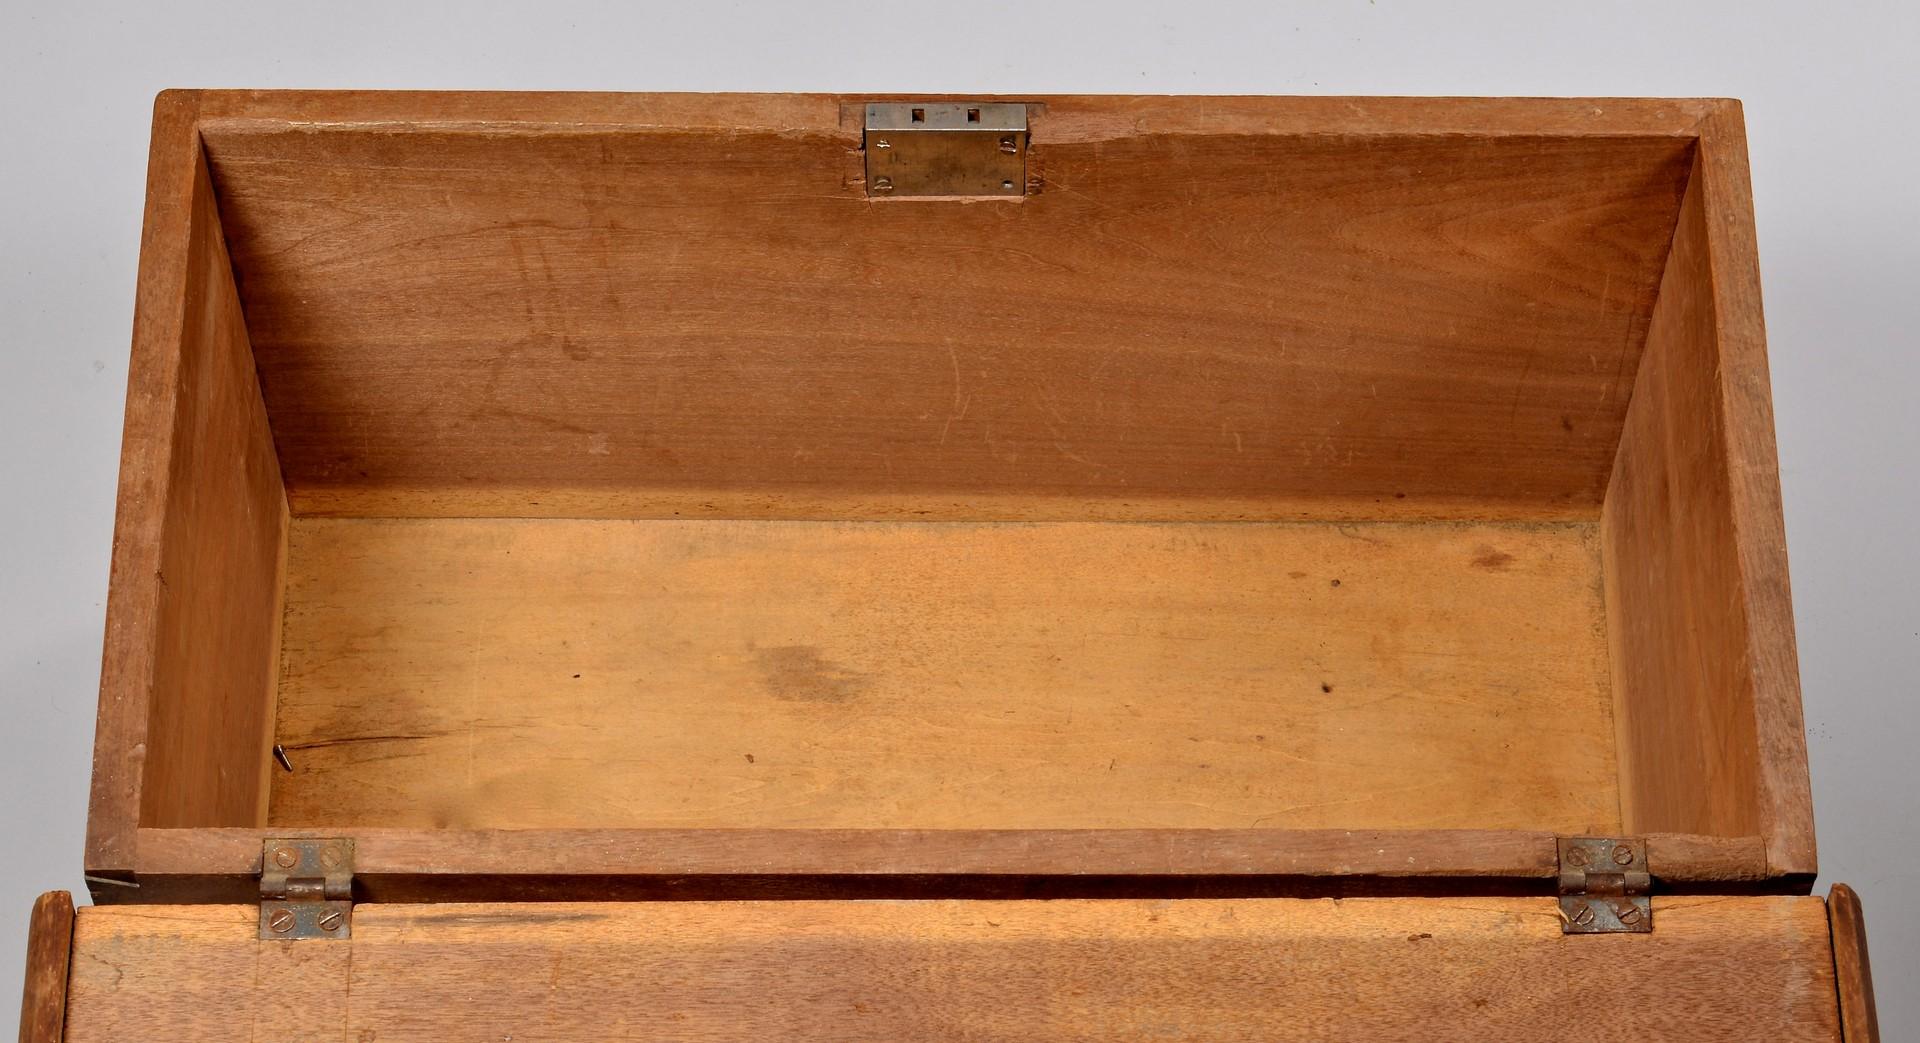 Lot 304: KY Walnut Dovetailed Blanket Box, Paris